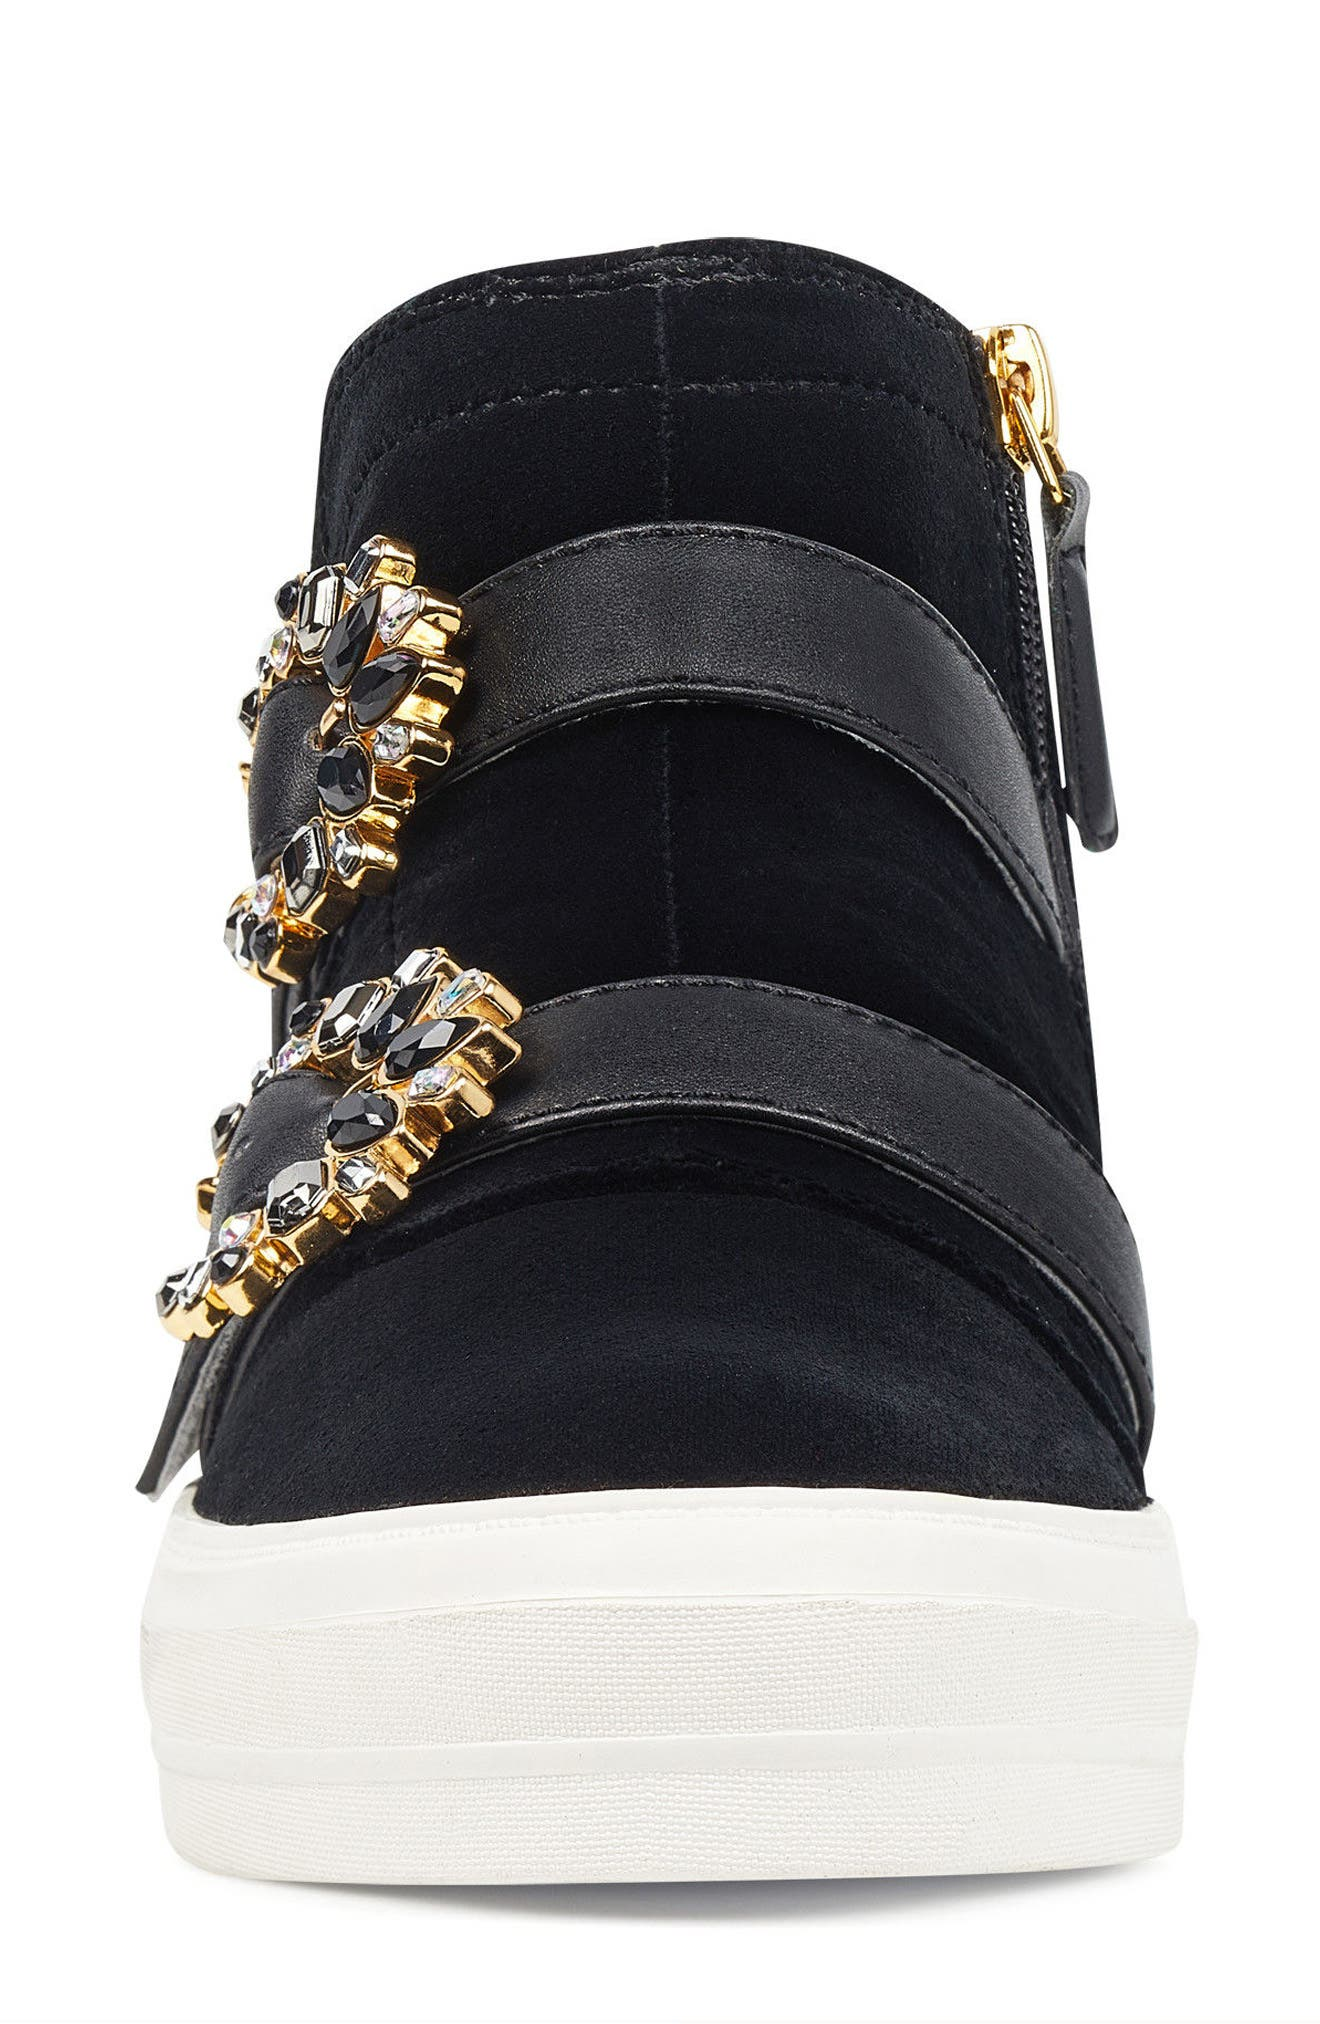 Orisna High Top Sneaker,                             Alternate thumbnail 4, color,                             002